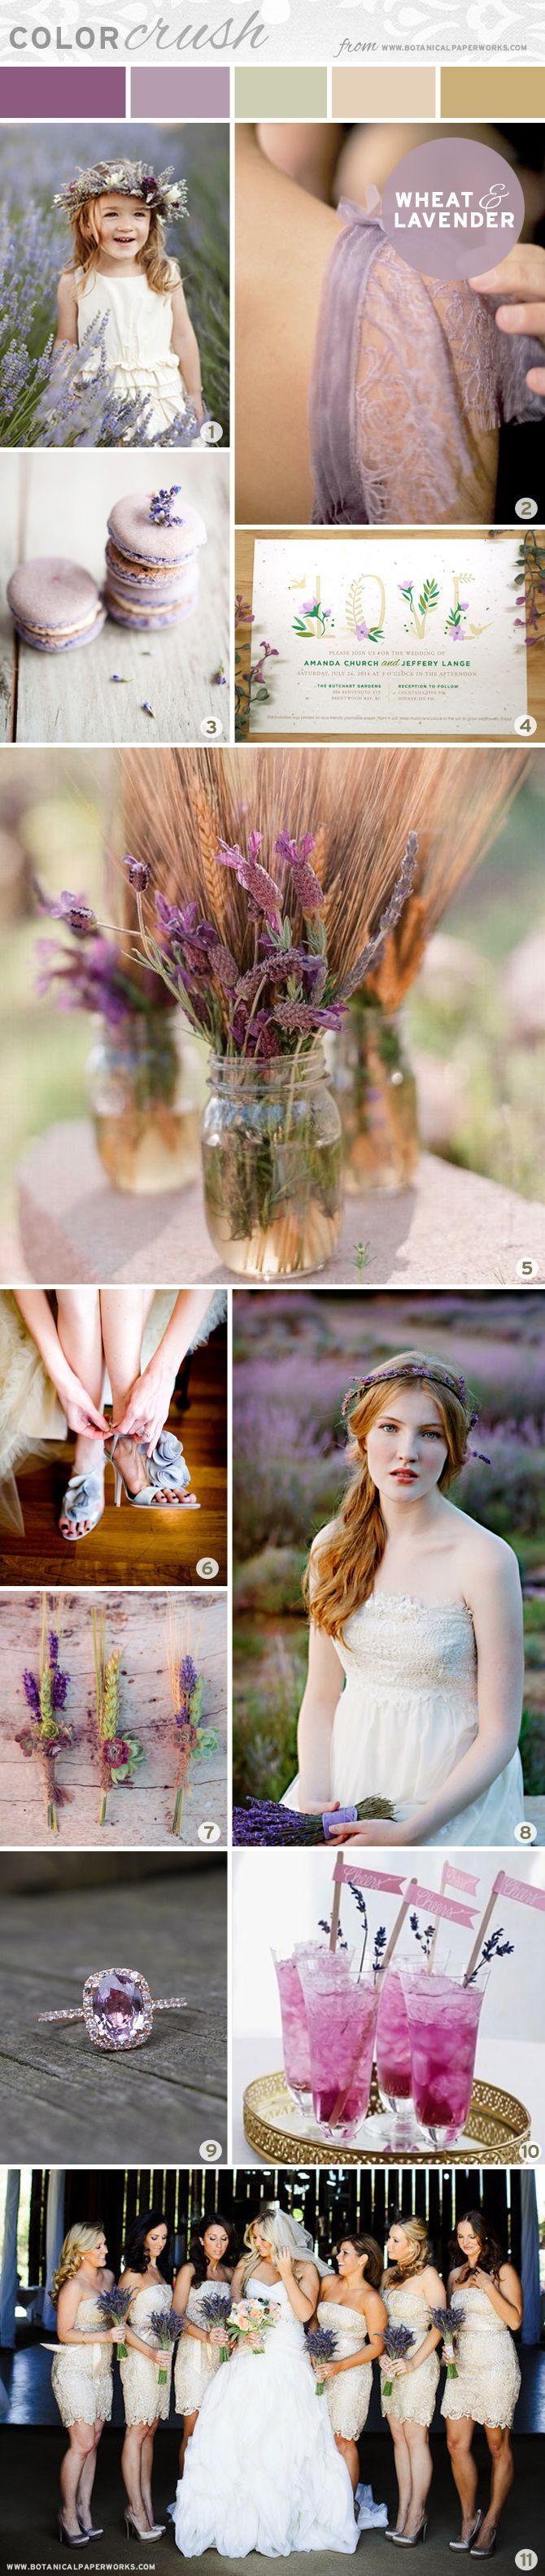 696 best Wedding Galore images on Pinterest